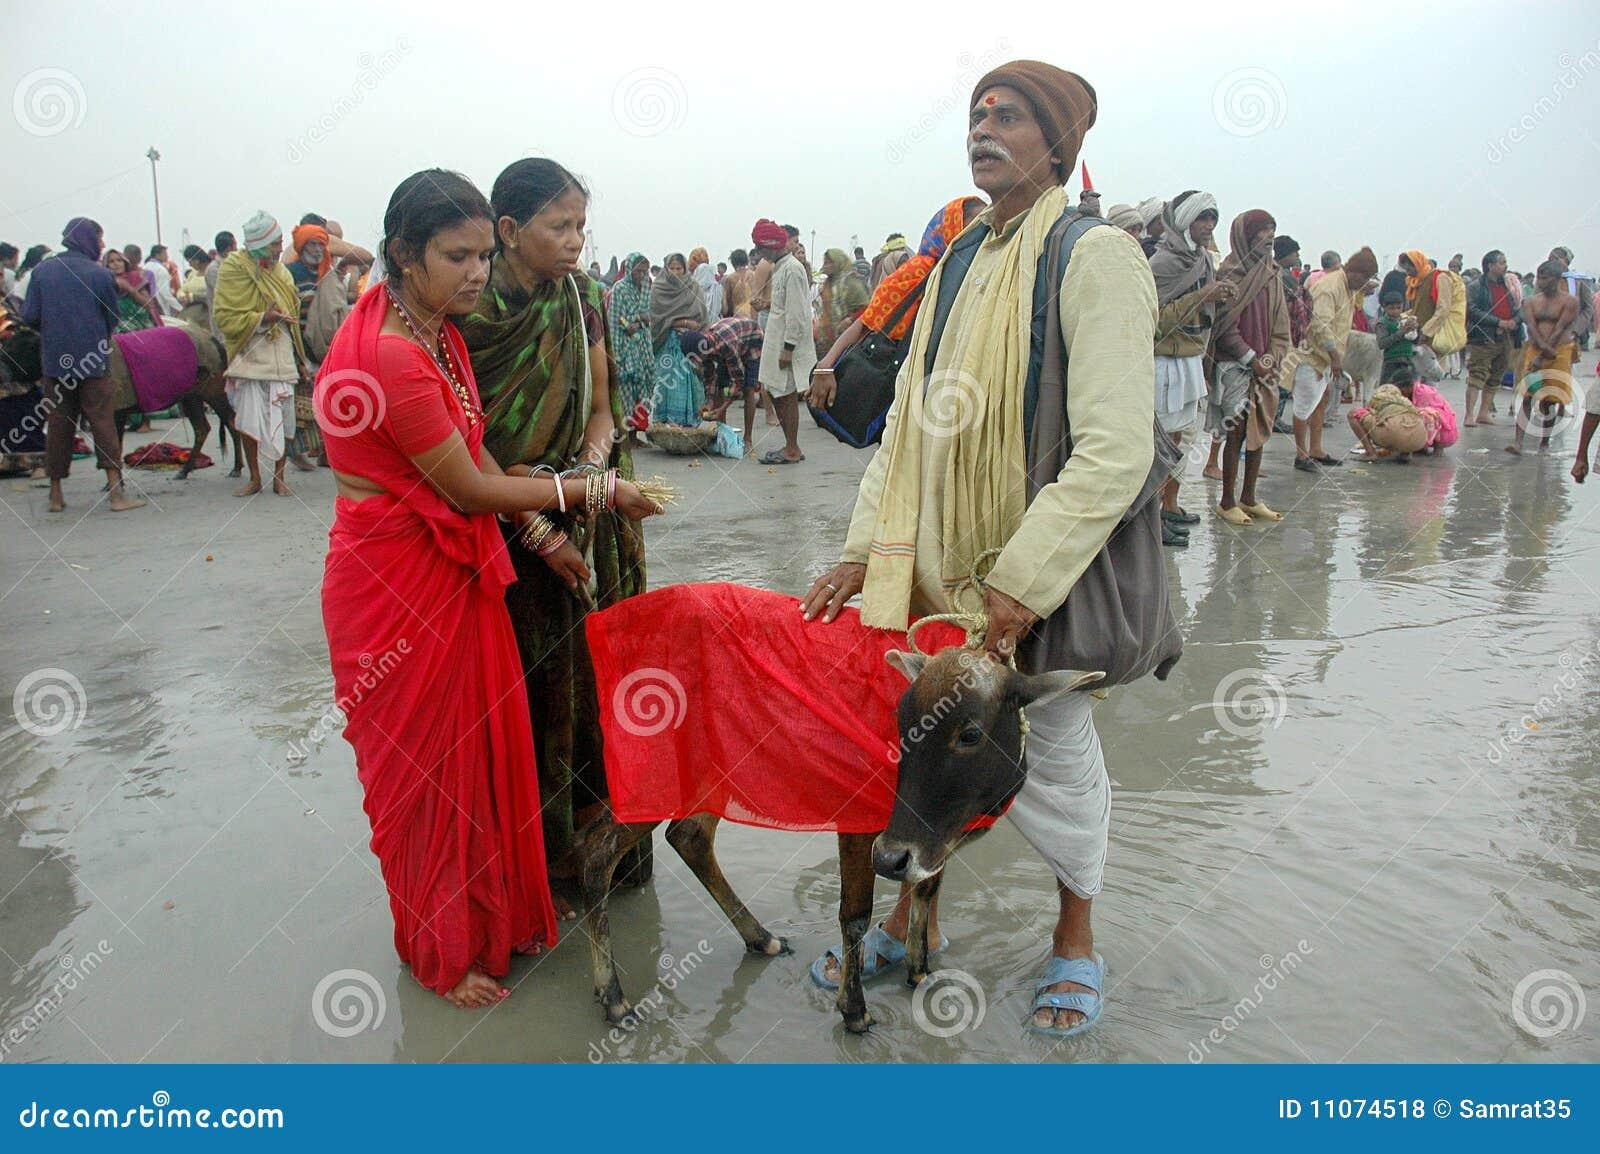 Ganga Sagar Festival in India 9